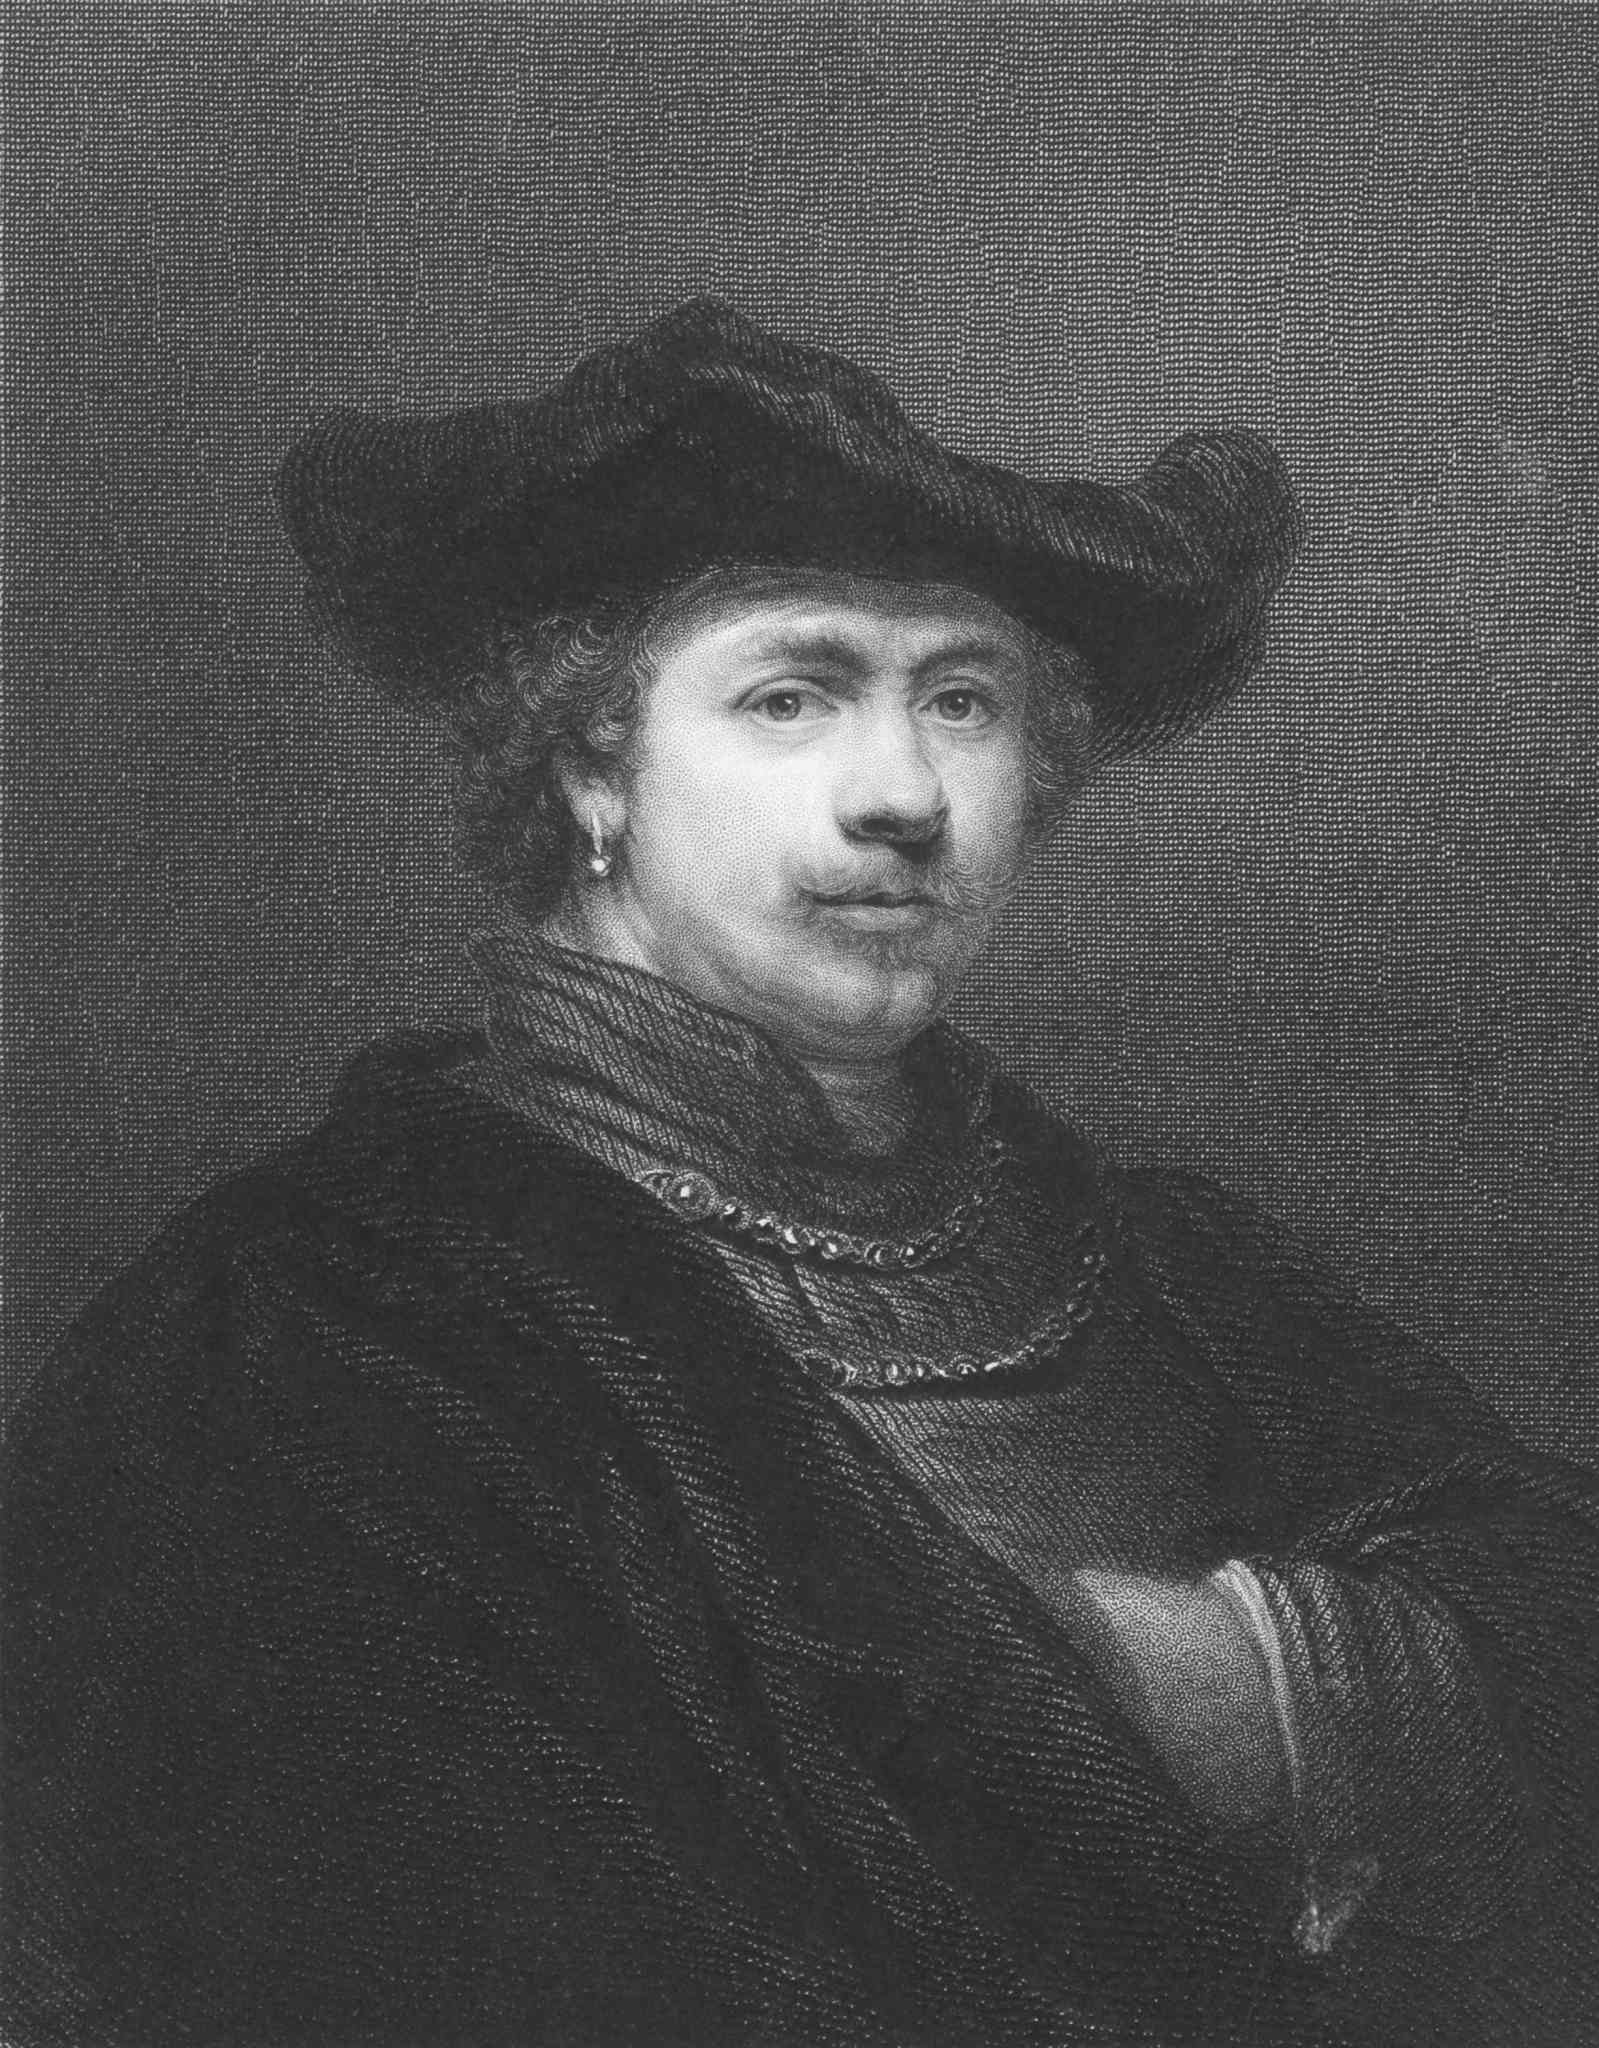 a biography of the renowned artist known as rembrandt van rijn Rembrandt was born in leiden, holland, on july 15, 1606 as the ninth of 10 children born to harmen gerritzsoon van rijn, a wealthy and prosperous miller, and neeltgen willemsdochter van zuytbrouck, the daughter of a baker.